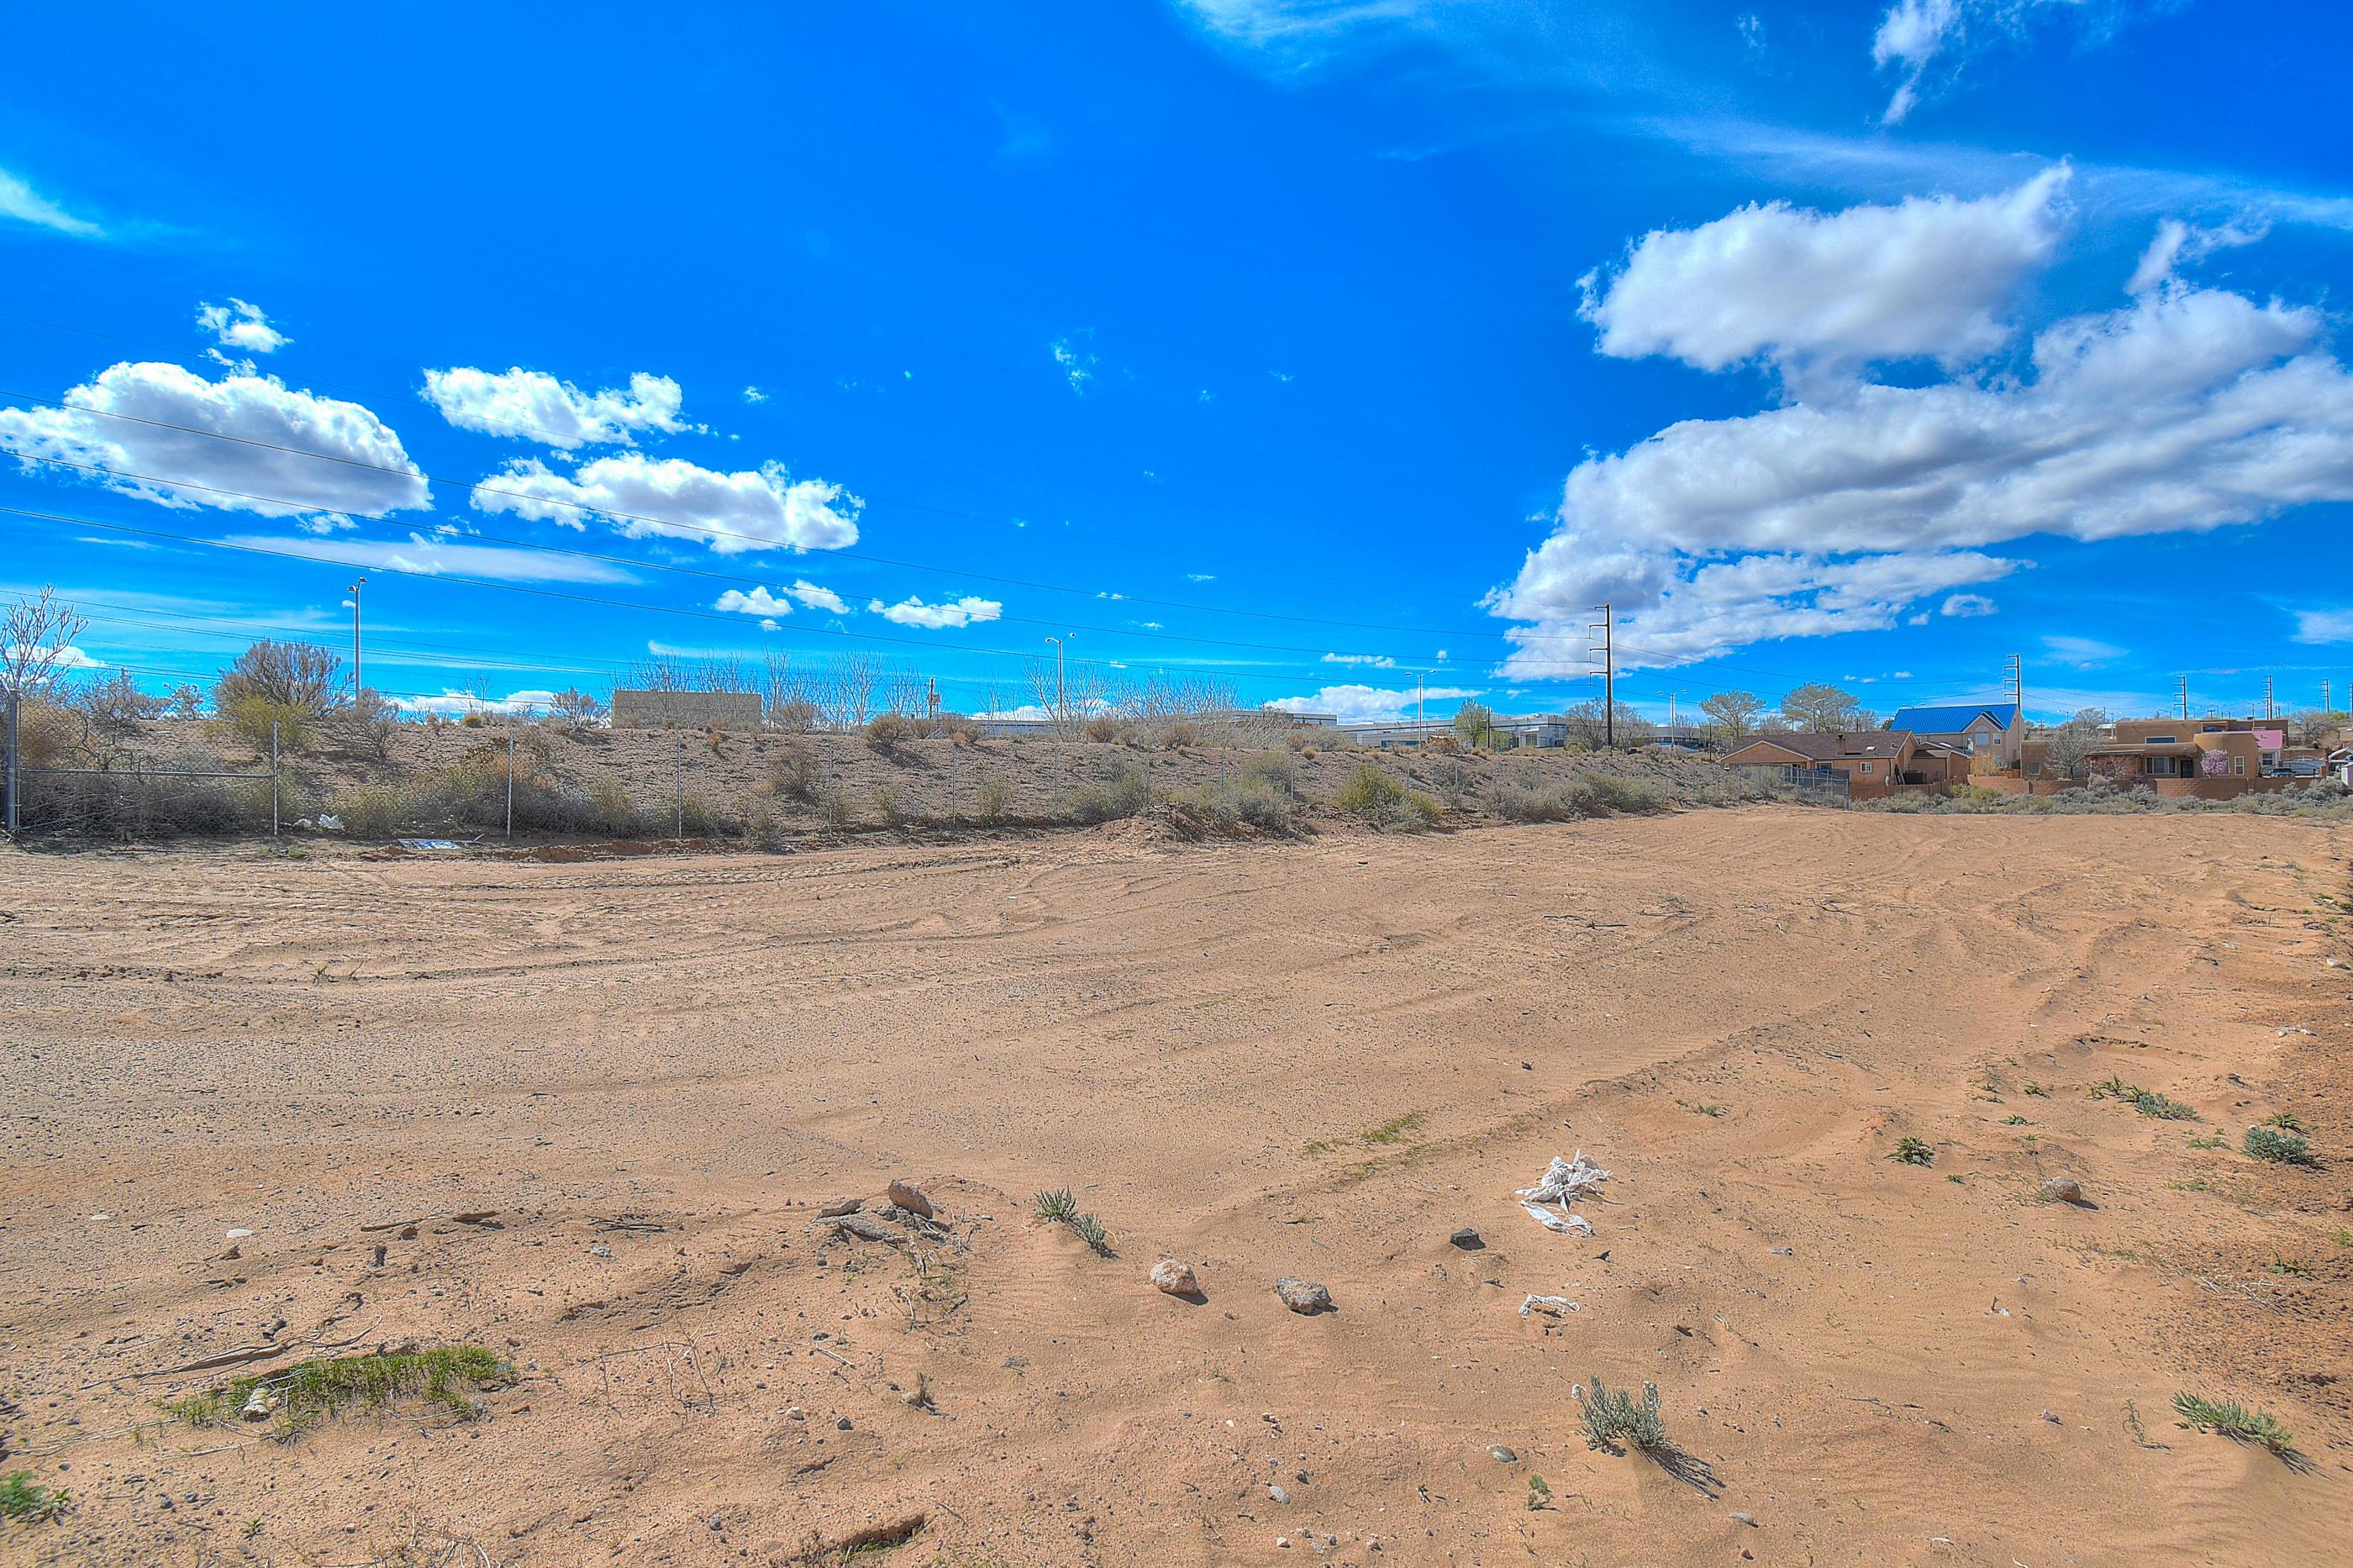 509 Monterrey Road NE, Rio Rancho in Sandoval County, NM 87144 Home for Sale